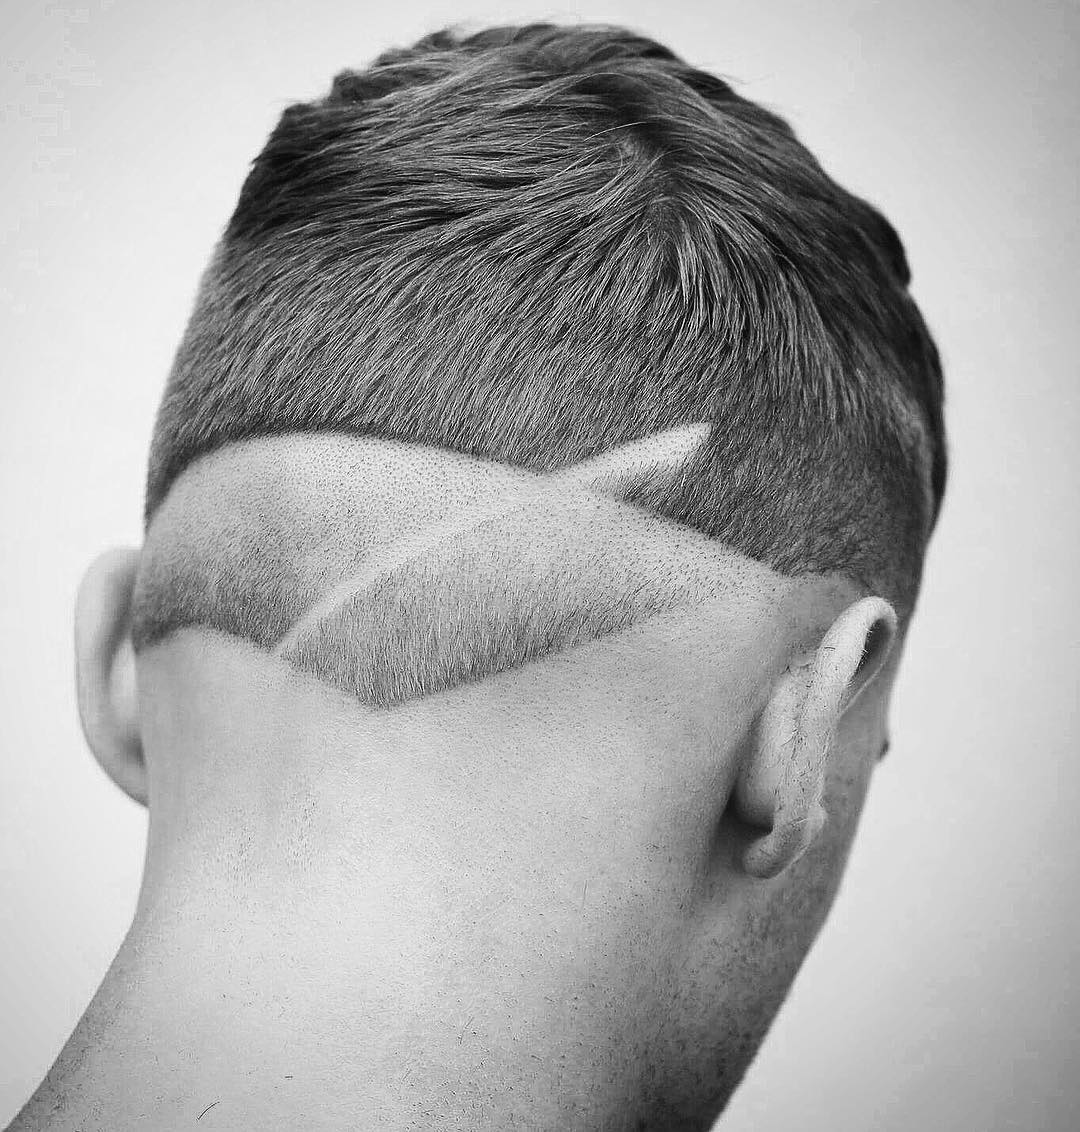 barber.josh.o.p hair tattoo shaved line mens haircuts neck design neckline hair